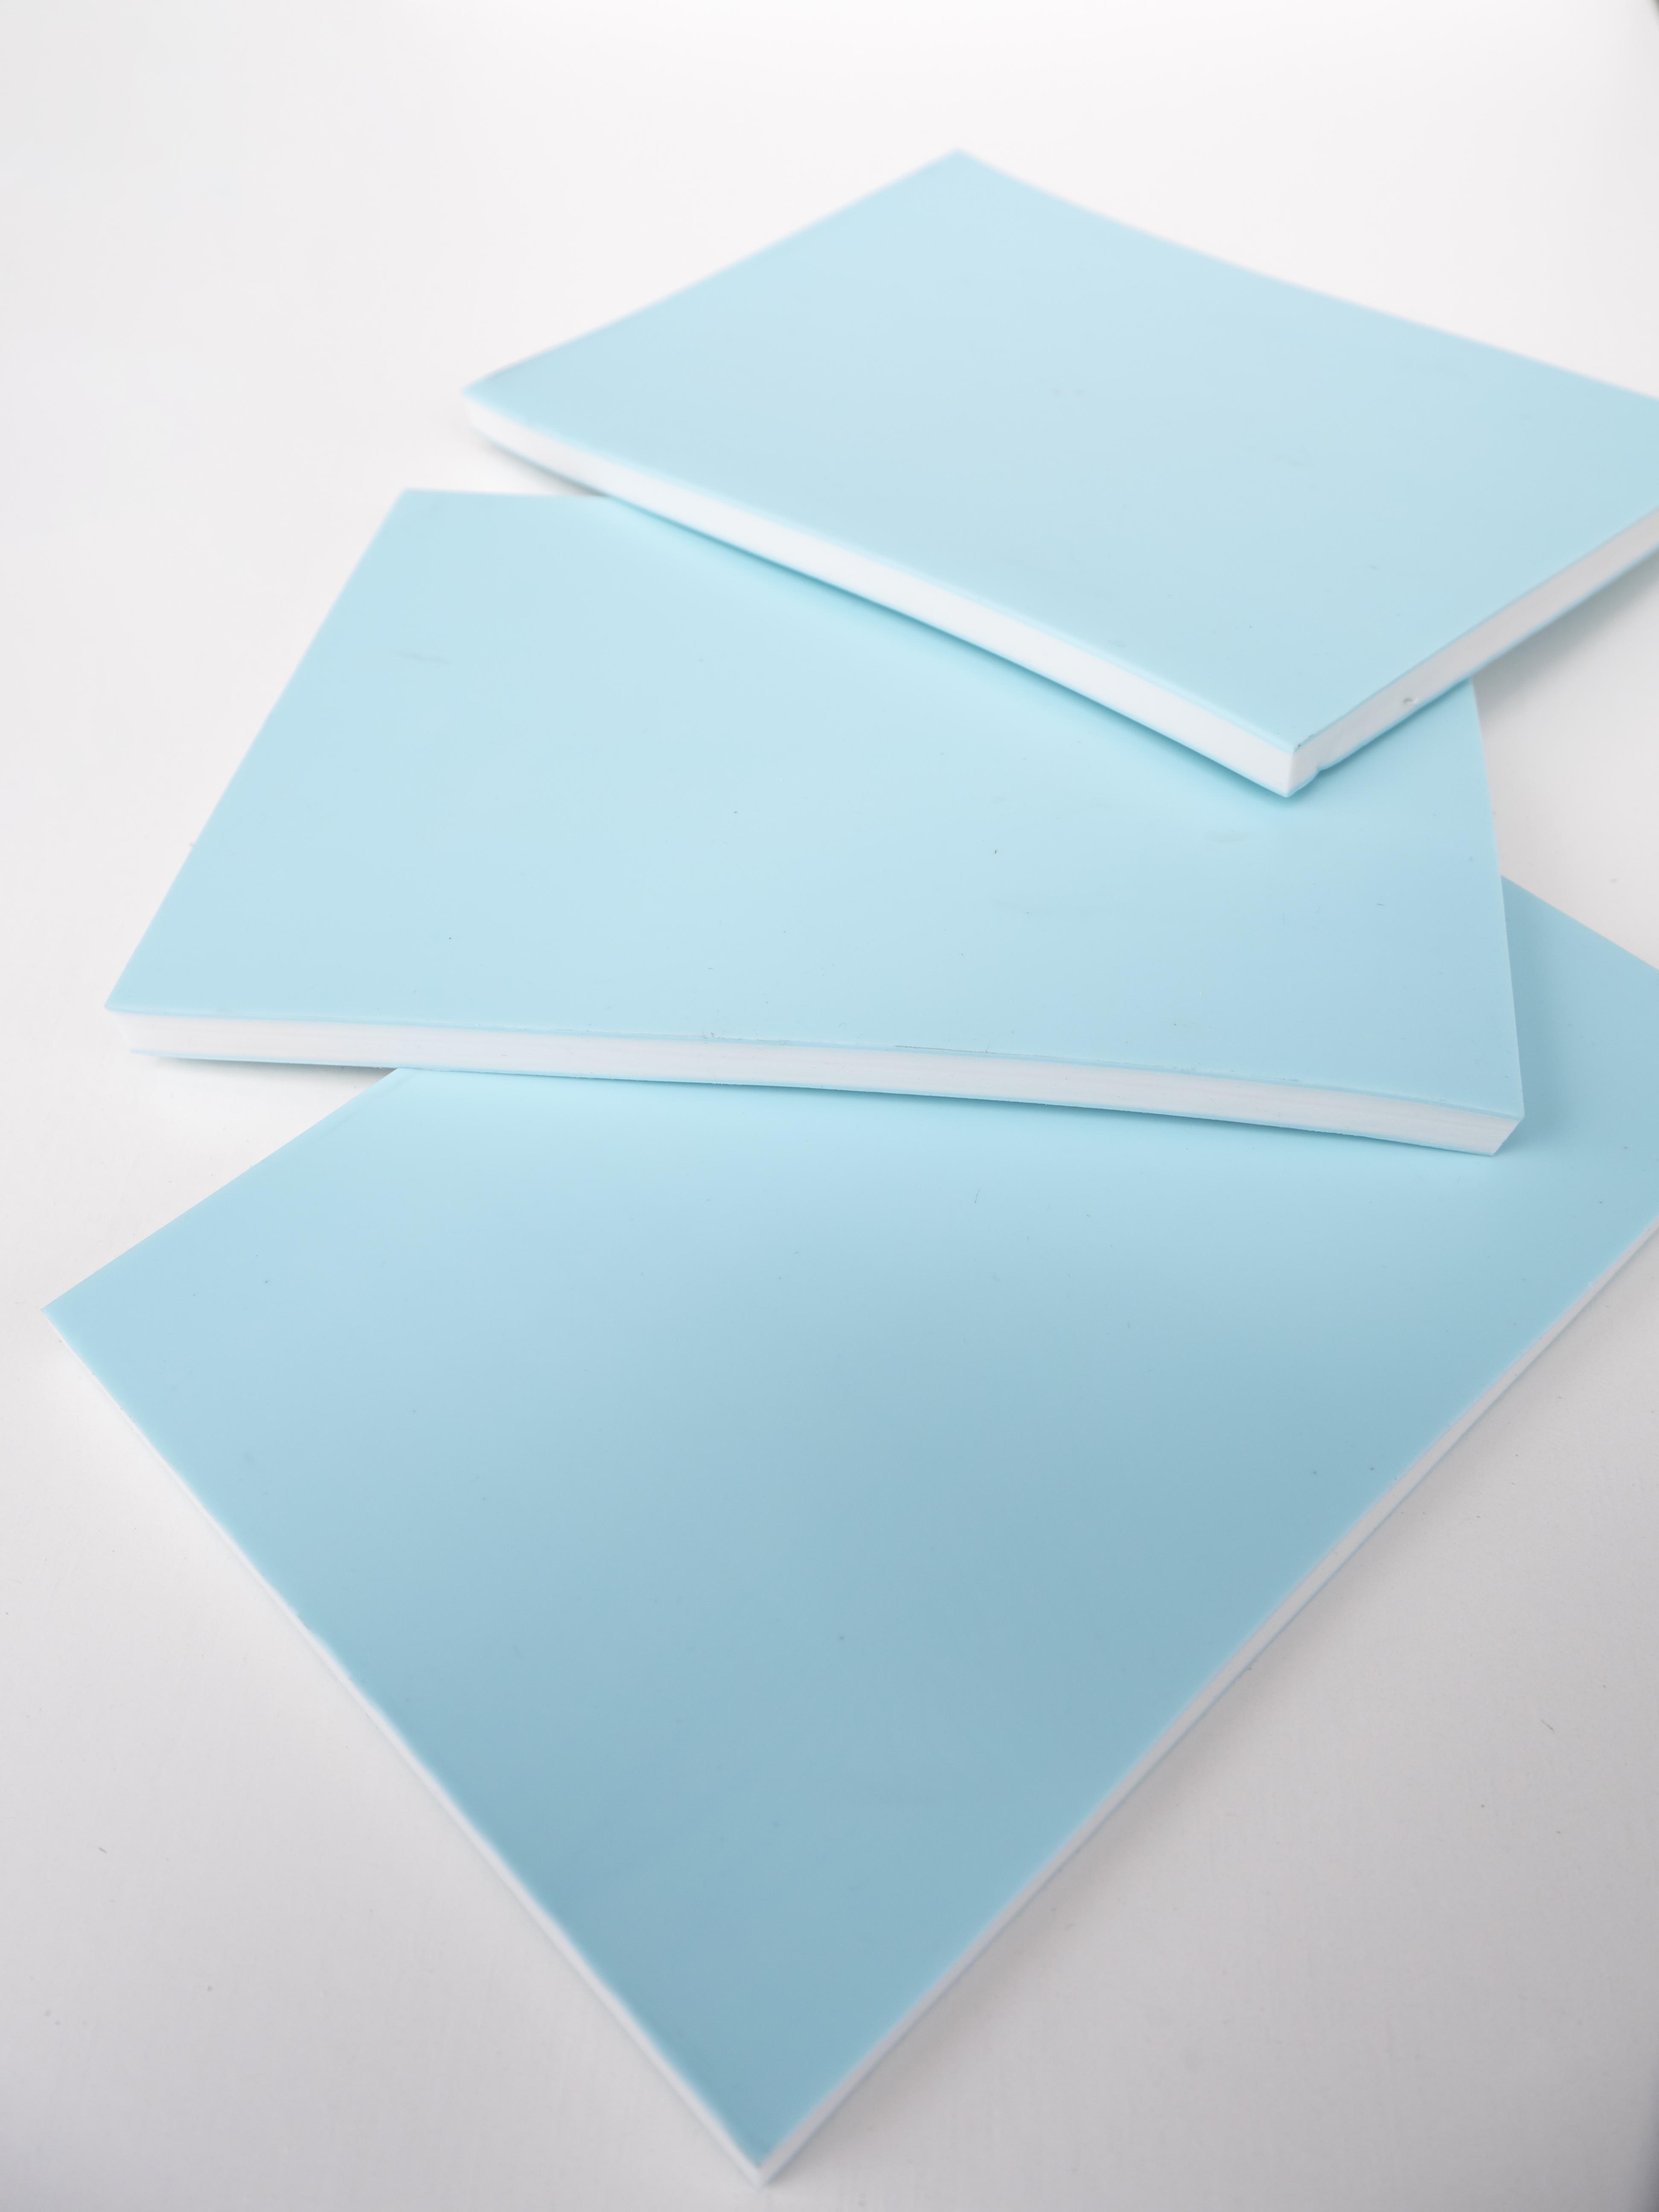 Rubber Stempel Blokken á 10.5 x 14.5 cm - Gekleurde Sandwich Stempel Rubber - Carving Blok voor DIY Stempel Mint Groen Natuurlijk Angelart 3 Rubber Stempel Blokken